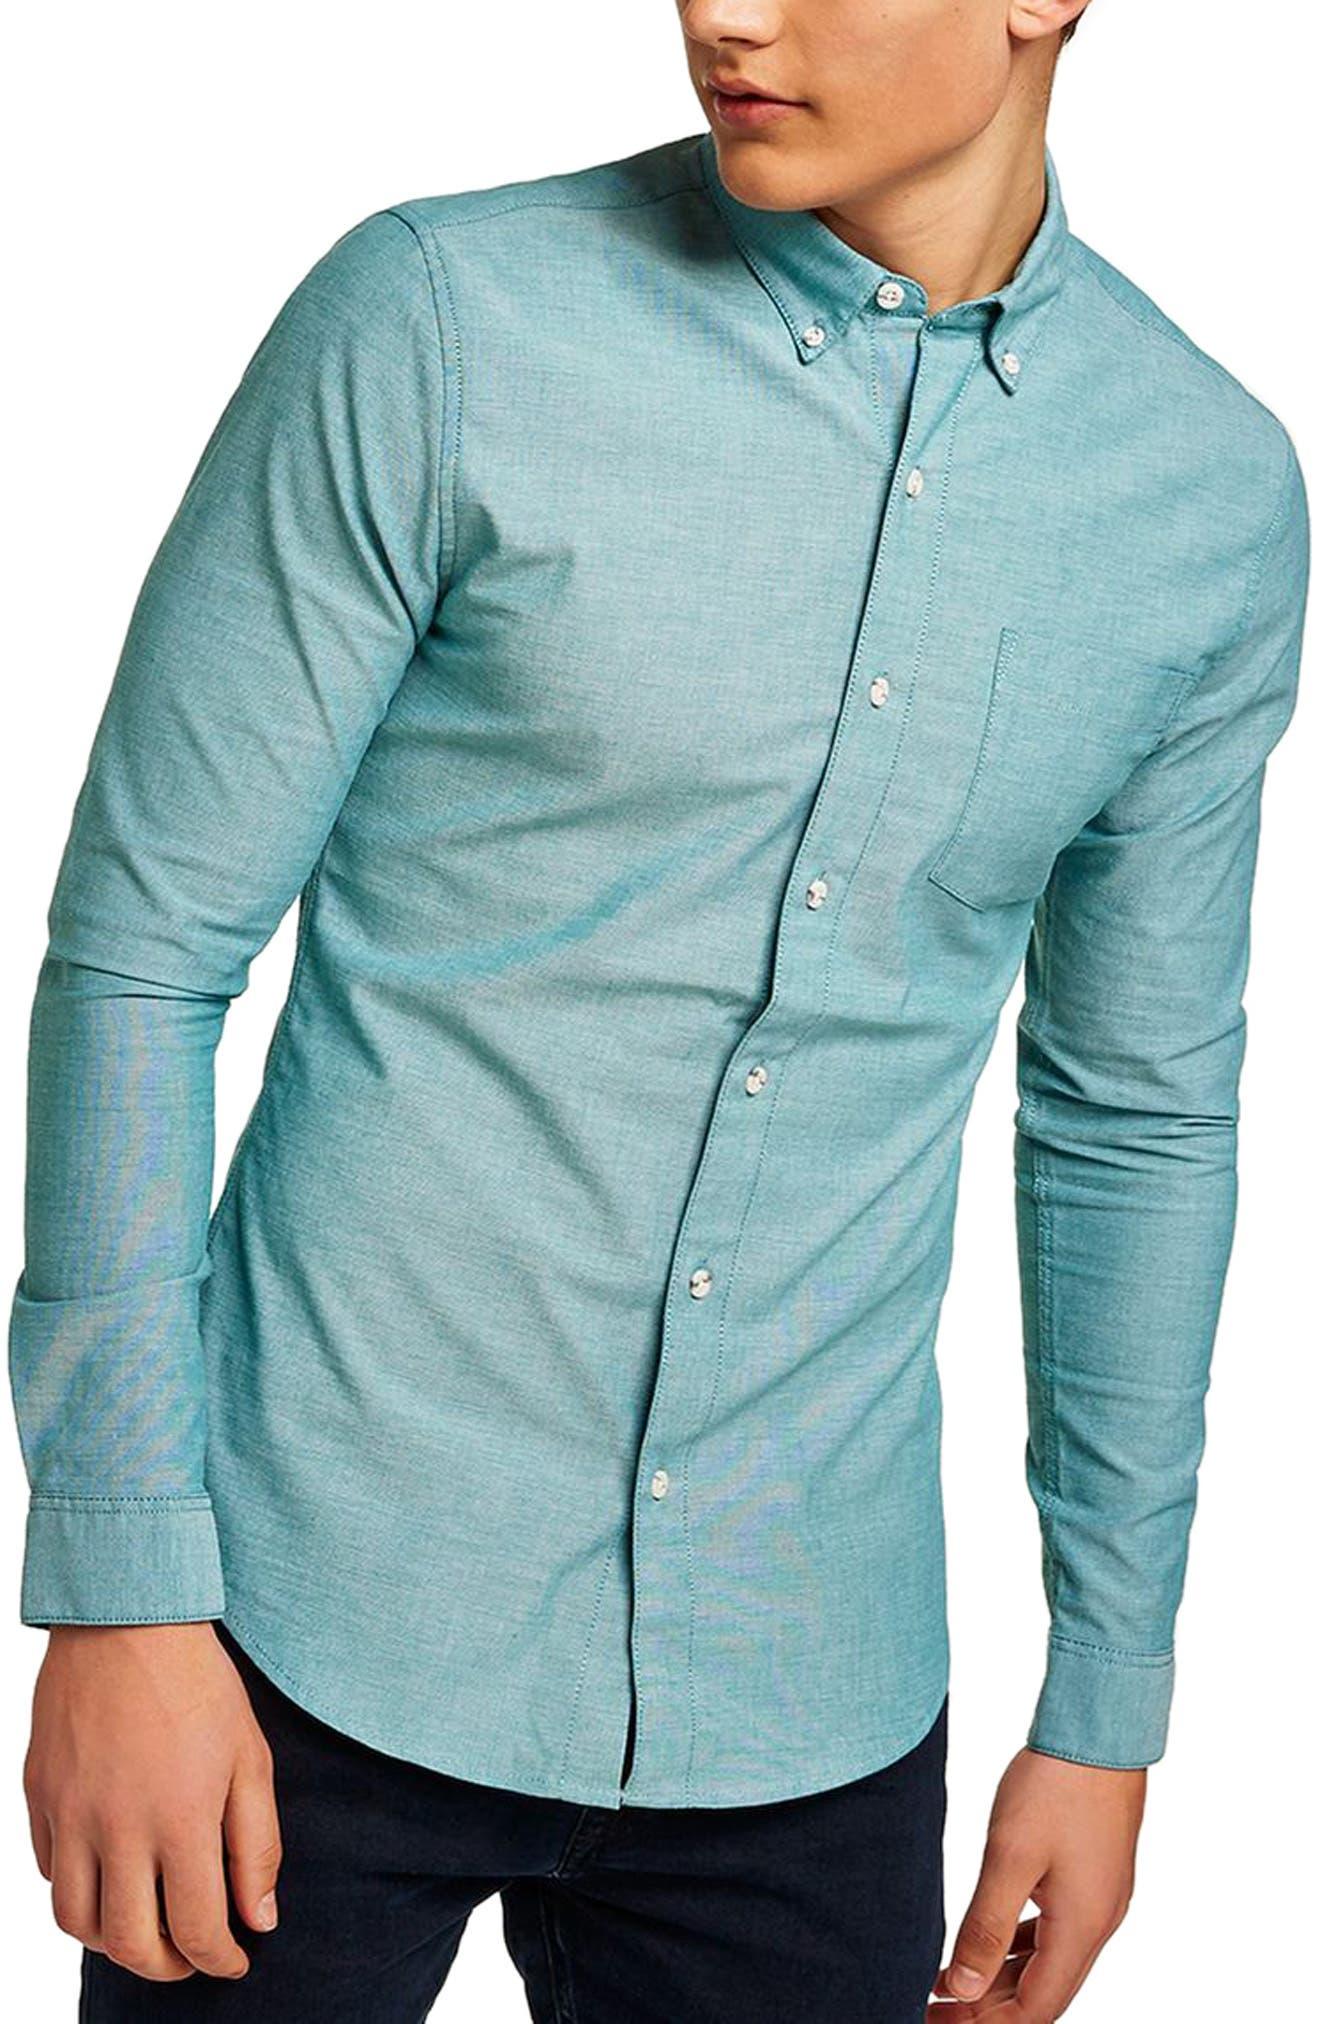 Muscle Fit Oxford Shirt,                             Main thumbnail 1, color,                             Blue